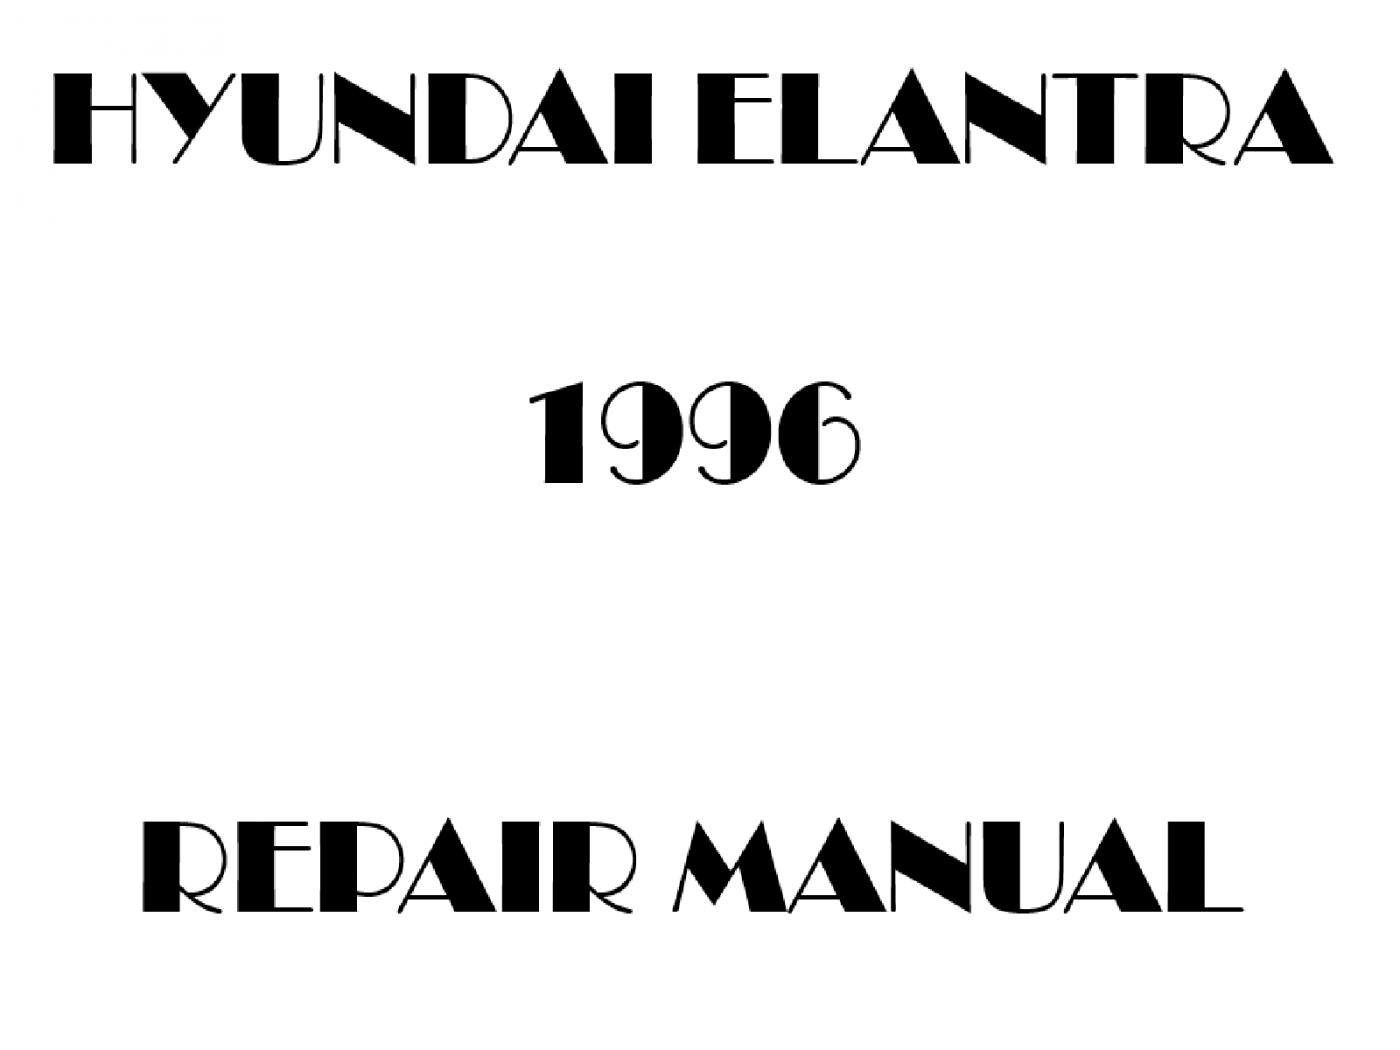 1996 Hyundai Elantra repair manual